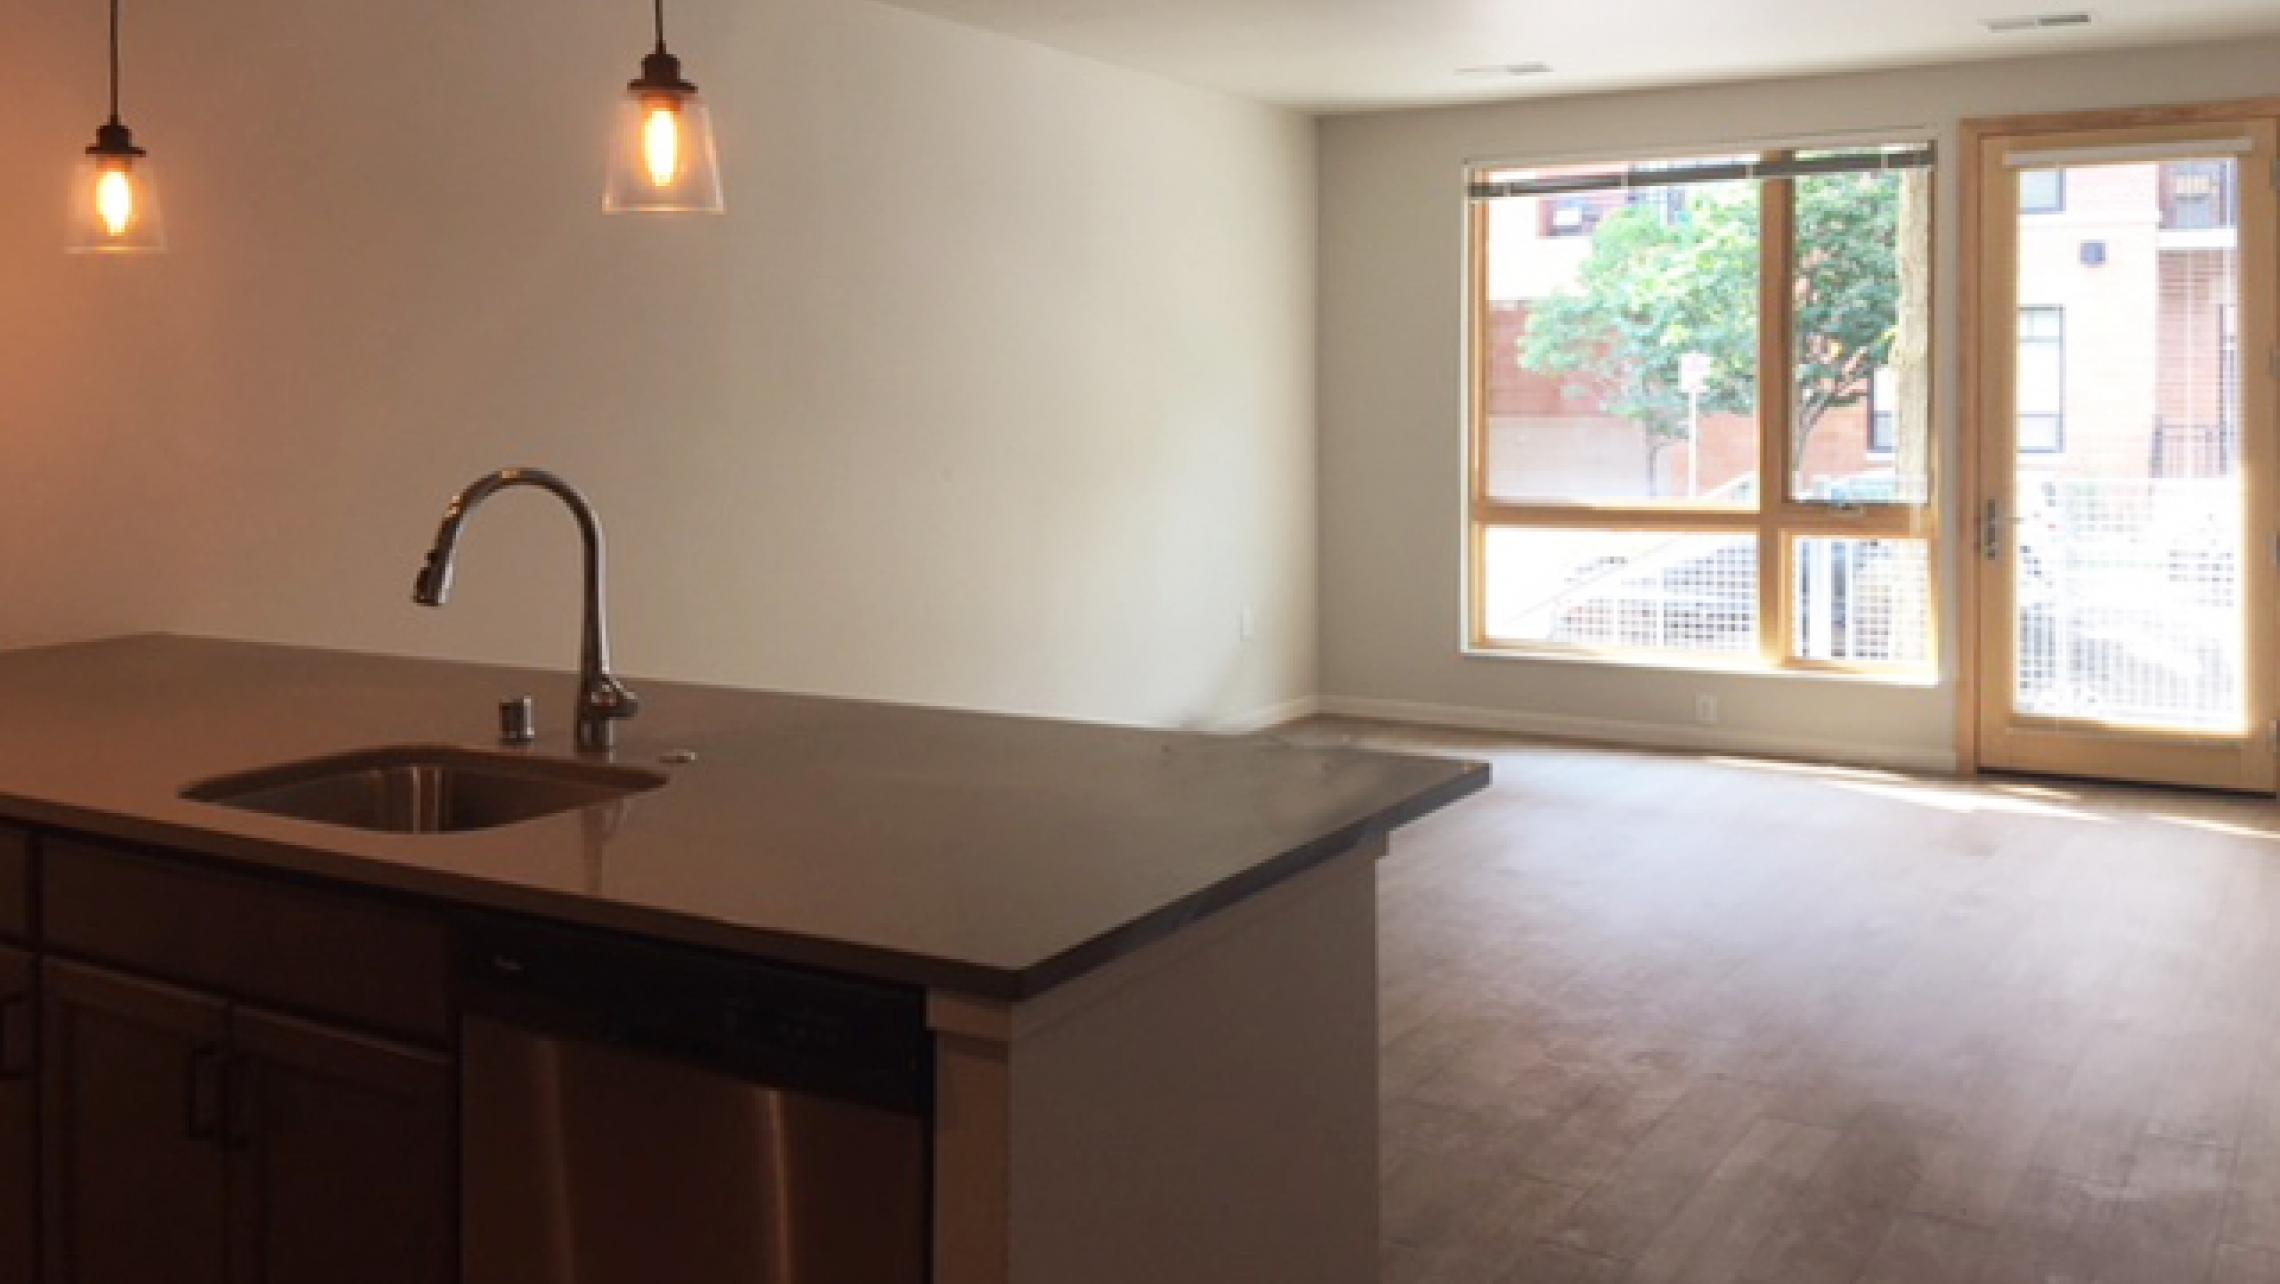 Quarter-Row-Apartments-123-One-Bedroom-Downtown-Madison-Modern-Upscale-Fitness-Lounge-Fireplace-Courtyard-Terrace-Patio-Design-Quartz-Bike-Path-Lake